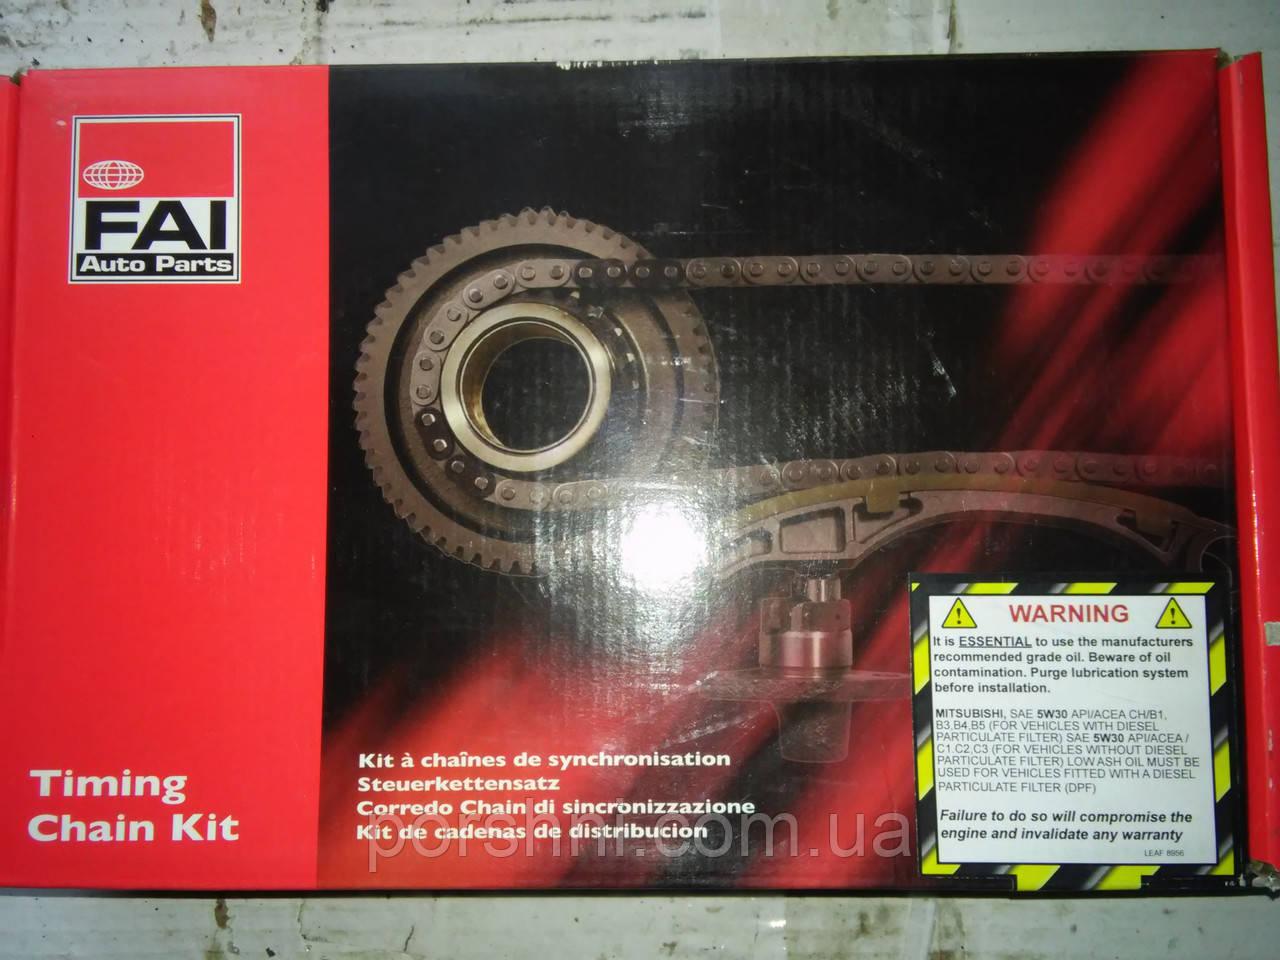 Цепь + успокоит + нат + звезды  двигат Моndeo  2.0  DURATEС  2001 -- FAI  TCK85